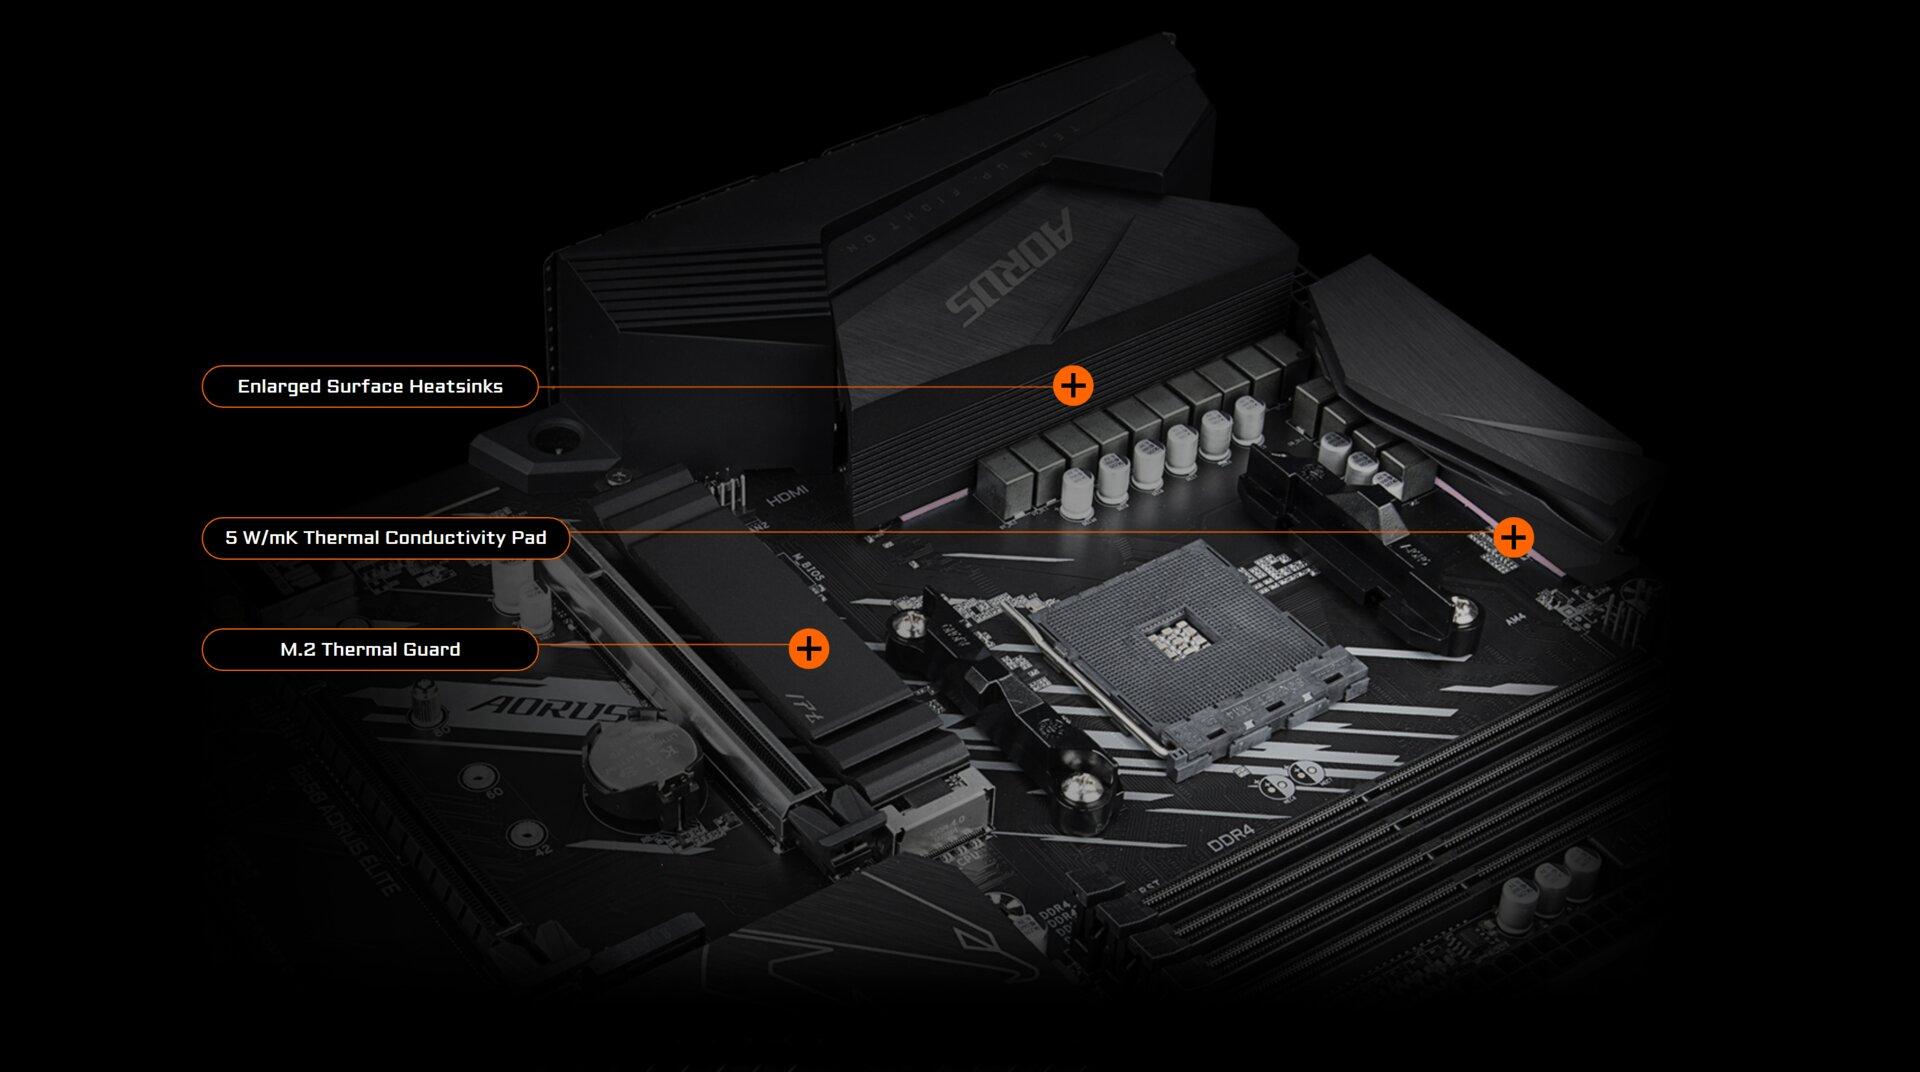 Gigabyte B550 Aorus Elite - Kühlkörper für die Spannungswandler